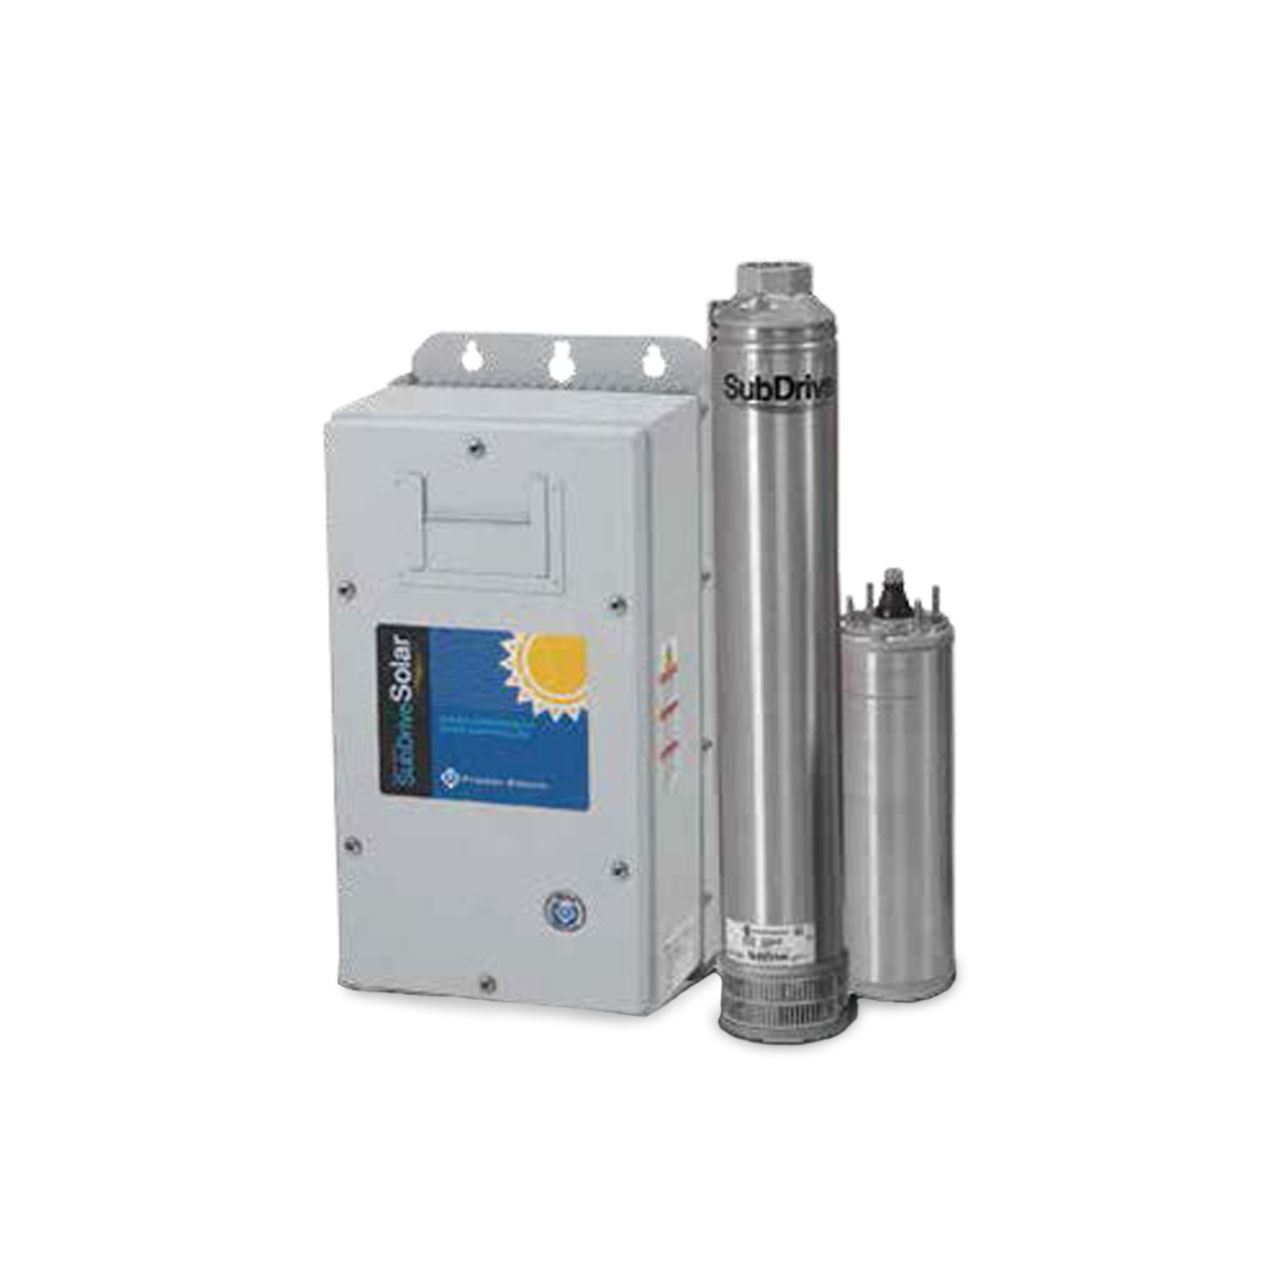 Franklin Electric Solar Pump Modern Design Of Wiring Diagram Subdrive Solarpak 1 5 Hp Kit Rh Rcworst Com